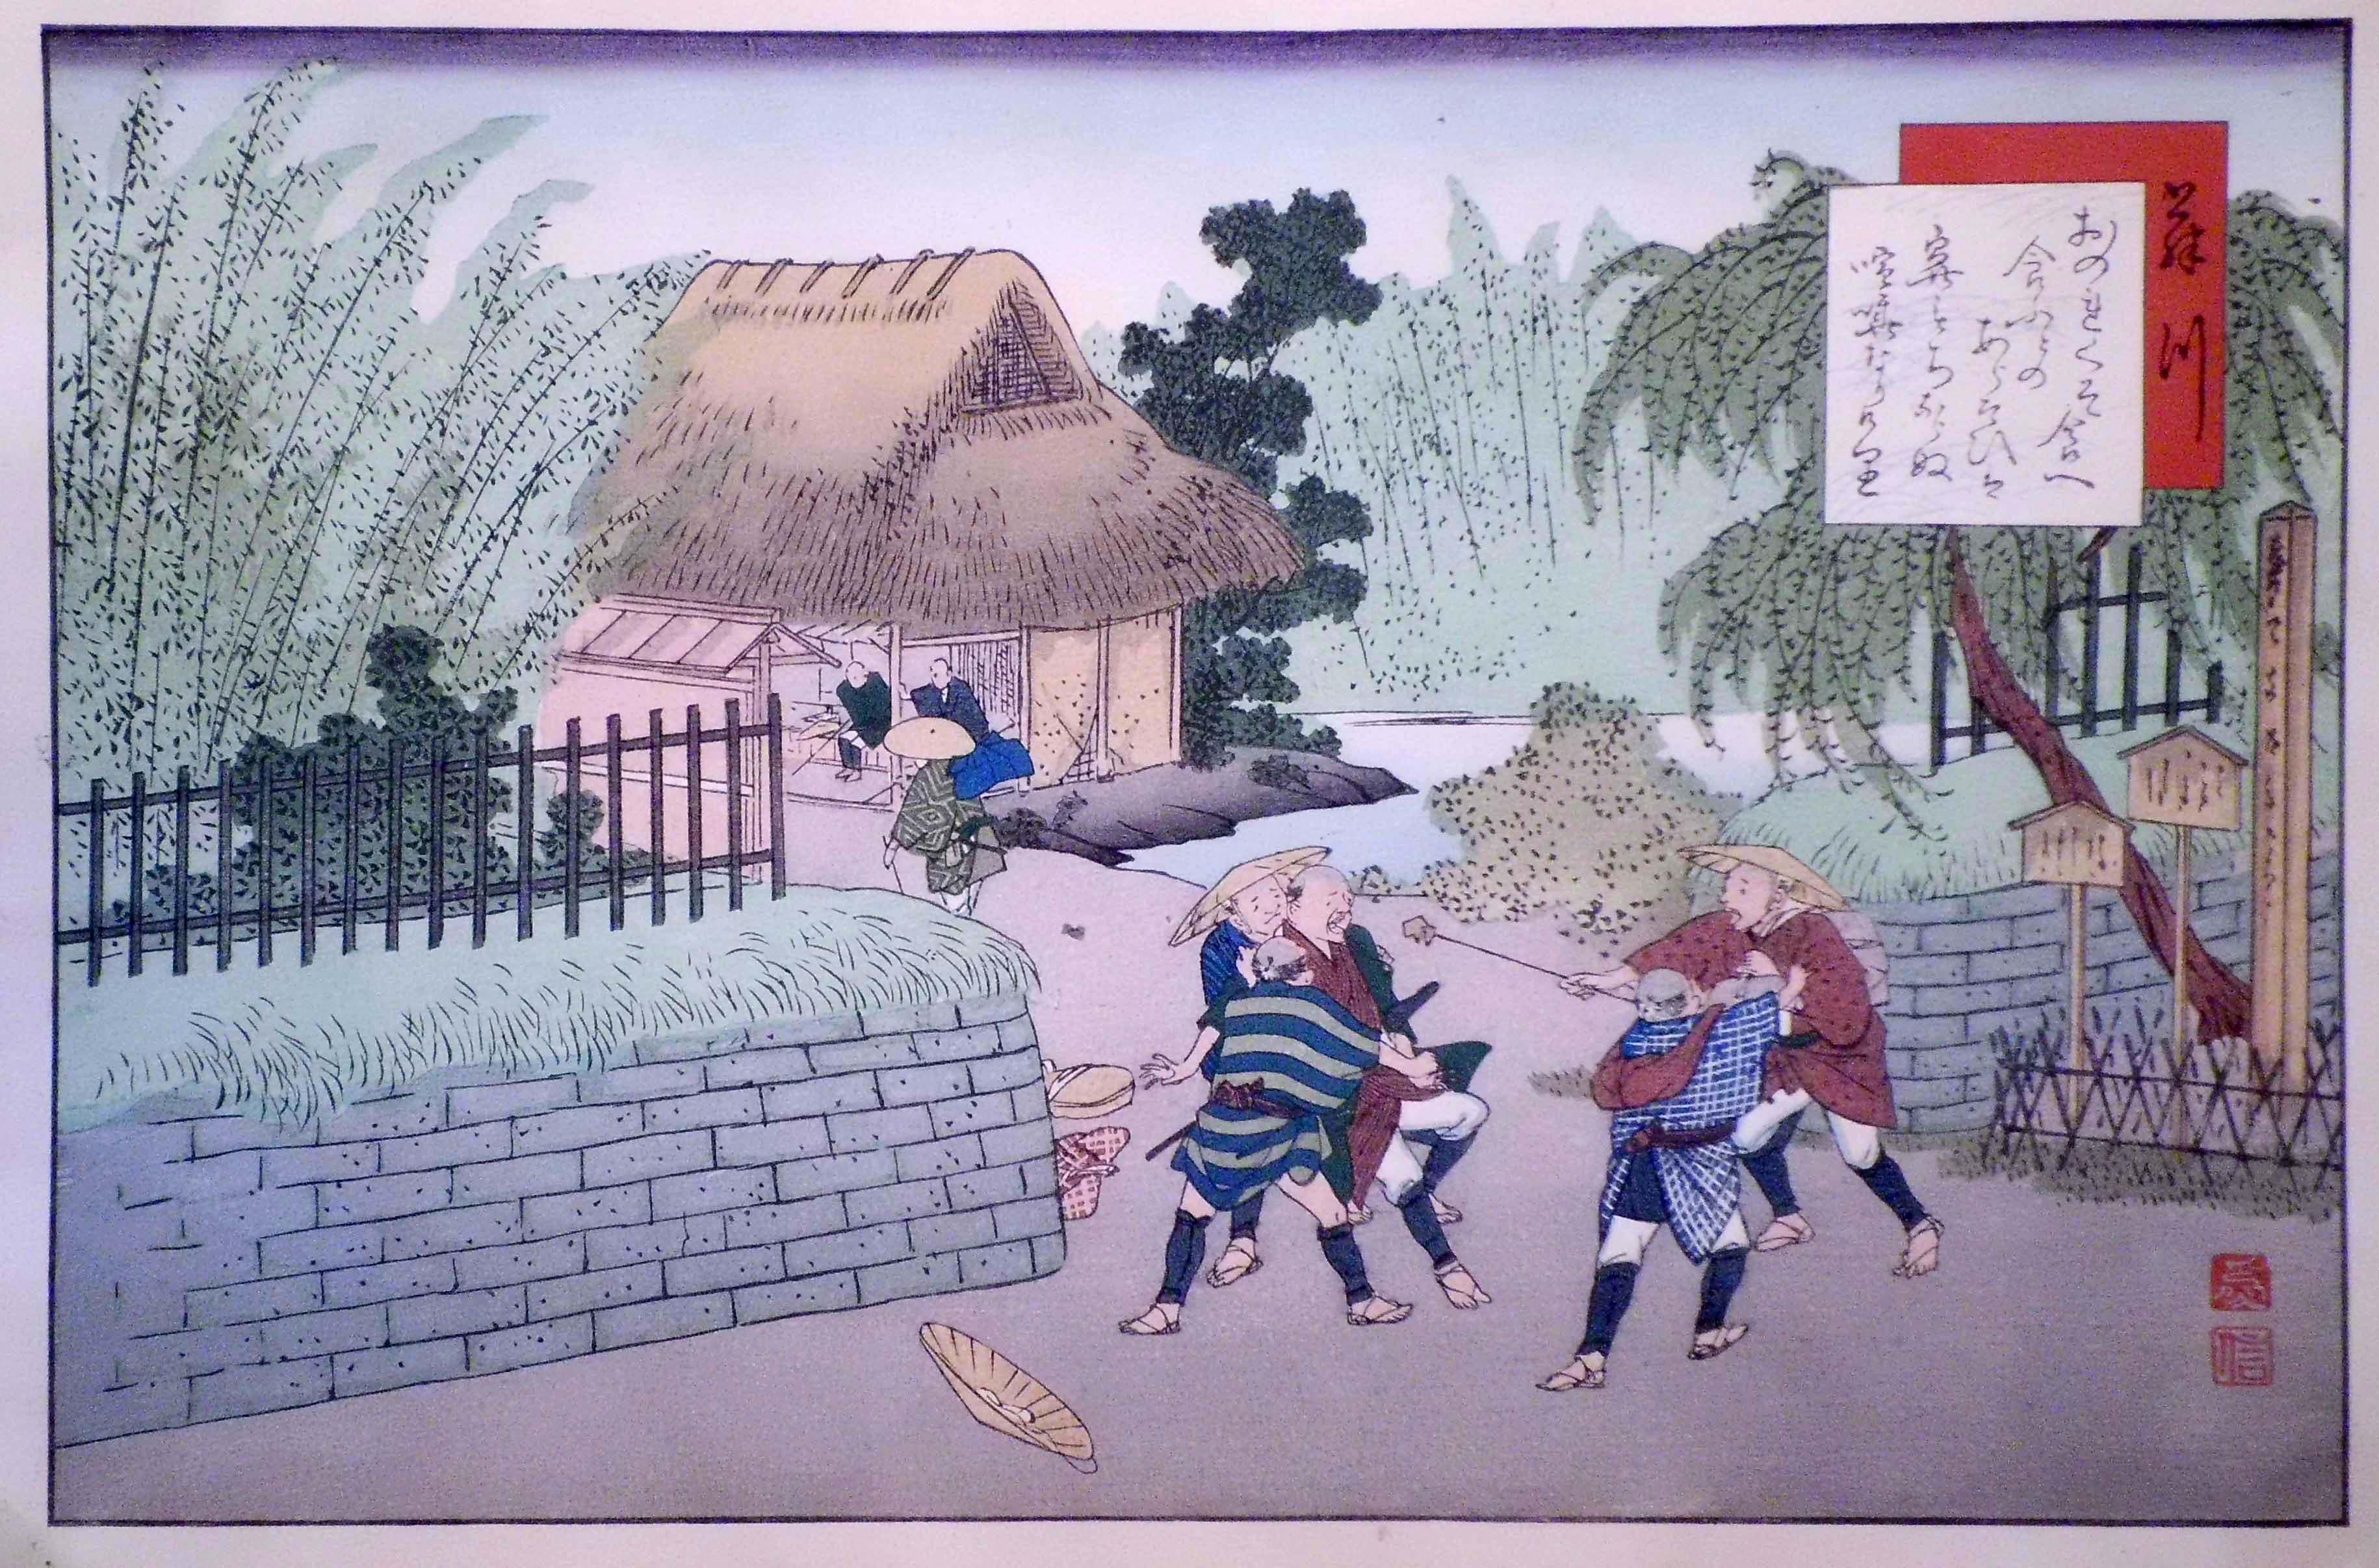 Fujikawa TAMENOBU (attivo nel 1890/1914) – FUJIKAWA, TRENTASETTESIMA STAZIONE DELLA TOKAIDO